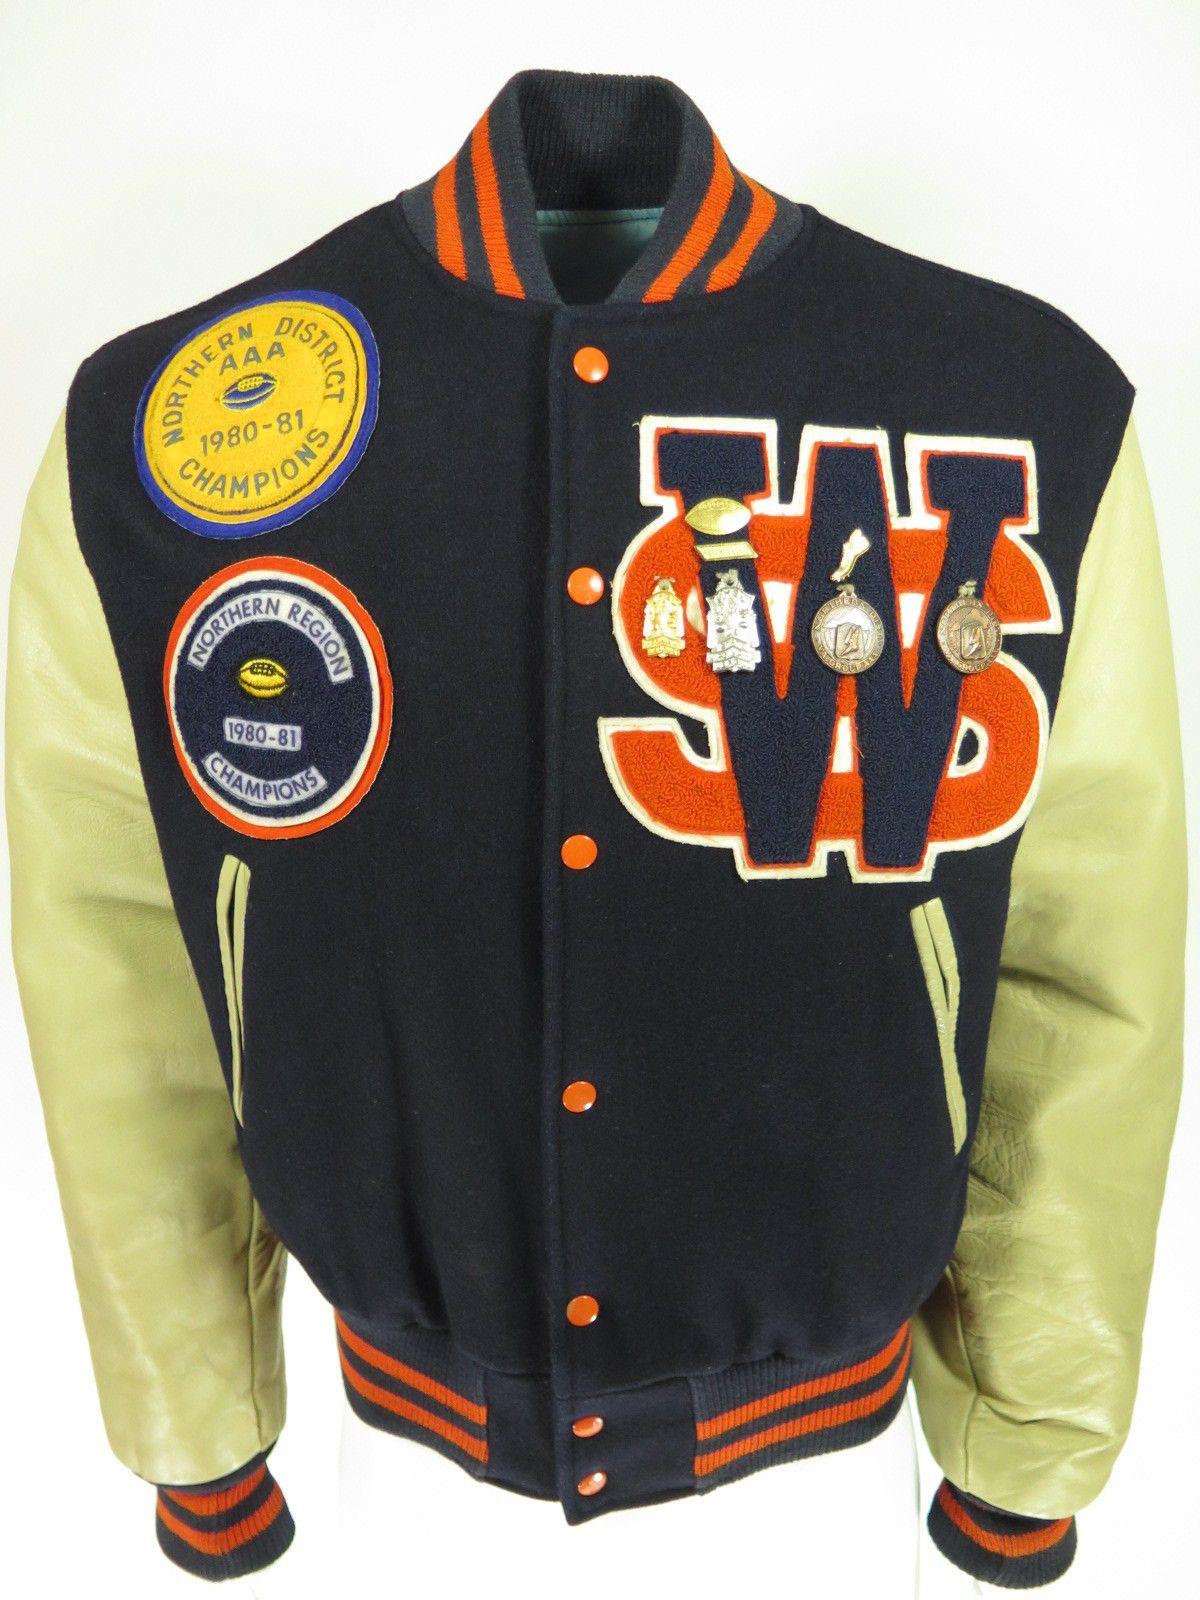 6ec31620655 Vtg 80s Varsity Virginia Football Letterman Jacket M or L Patch Wool  Leather